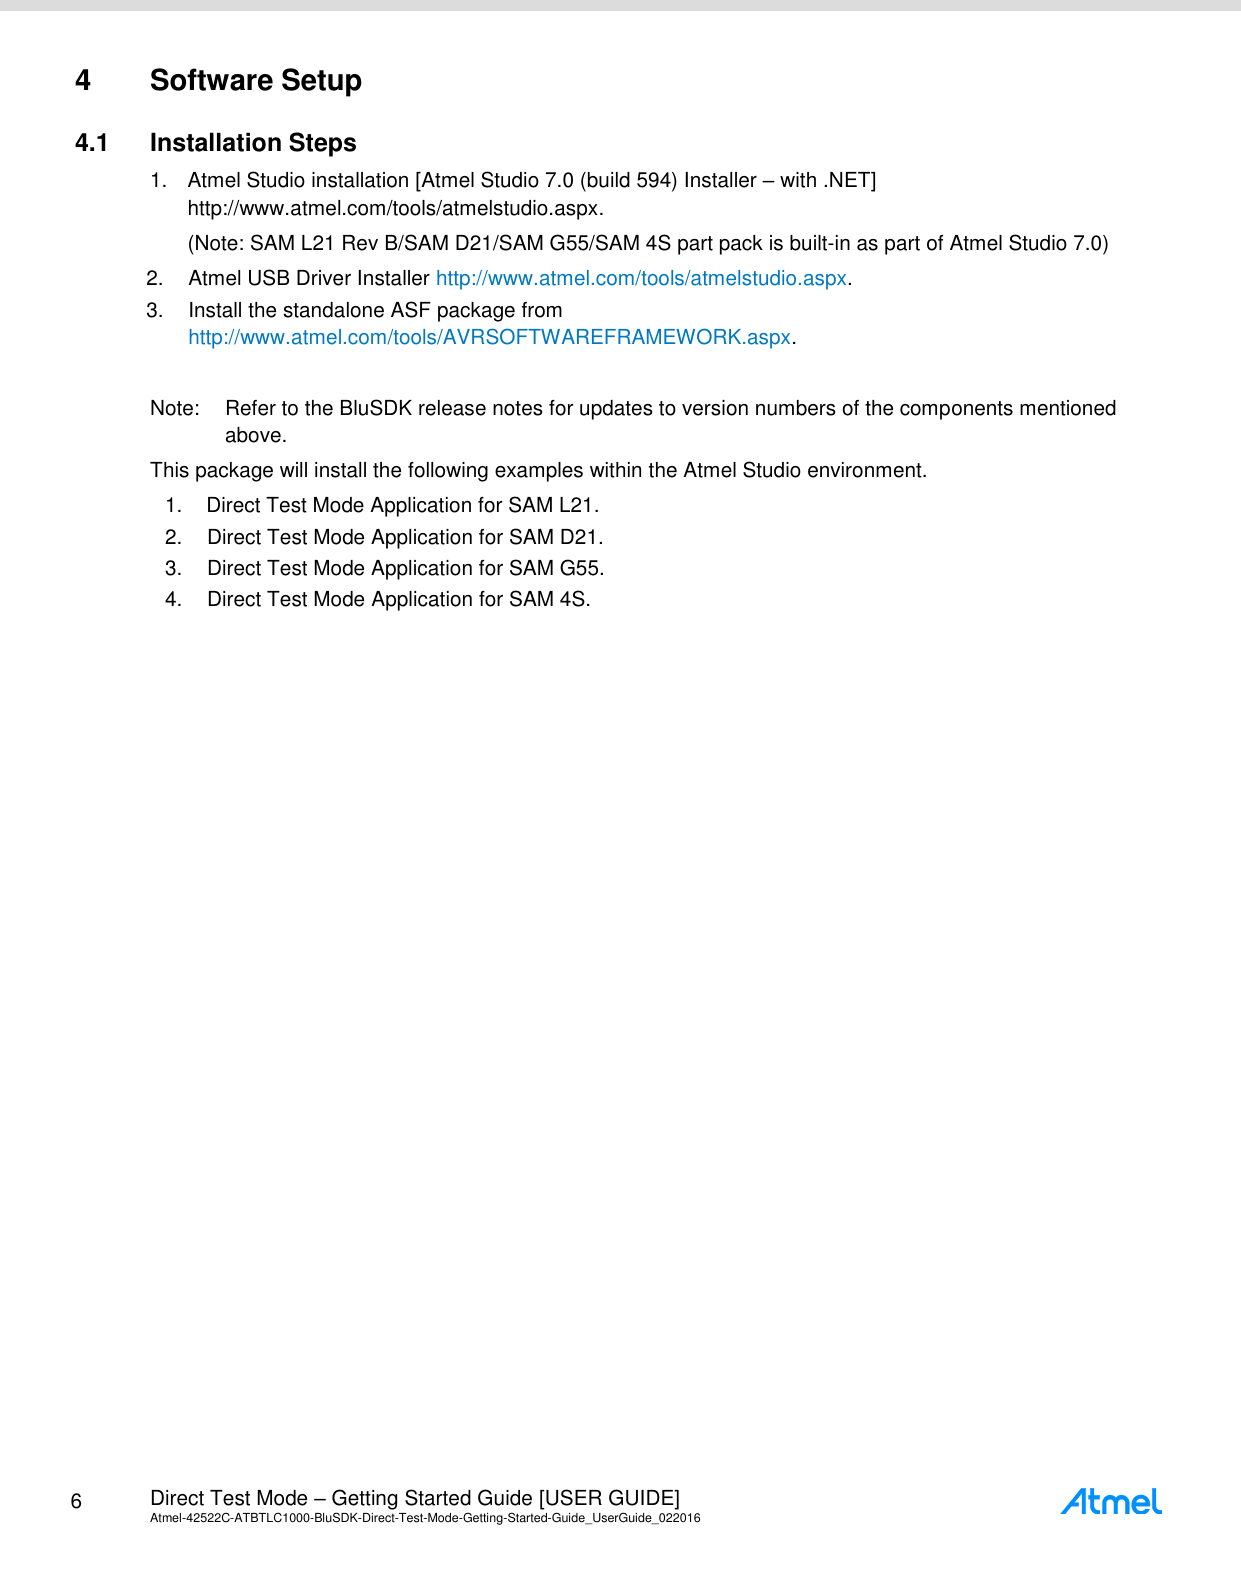 Direct Mode Getting Started Guide Atmel 42522 ATBTLC1000 Blu SDK